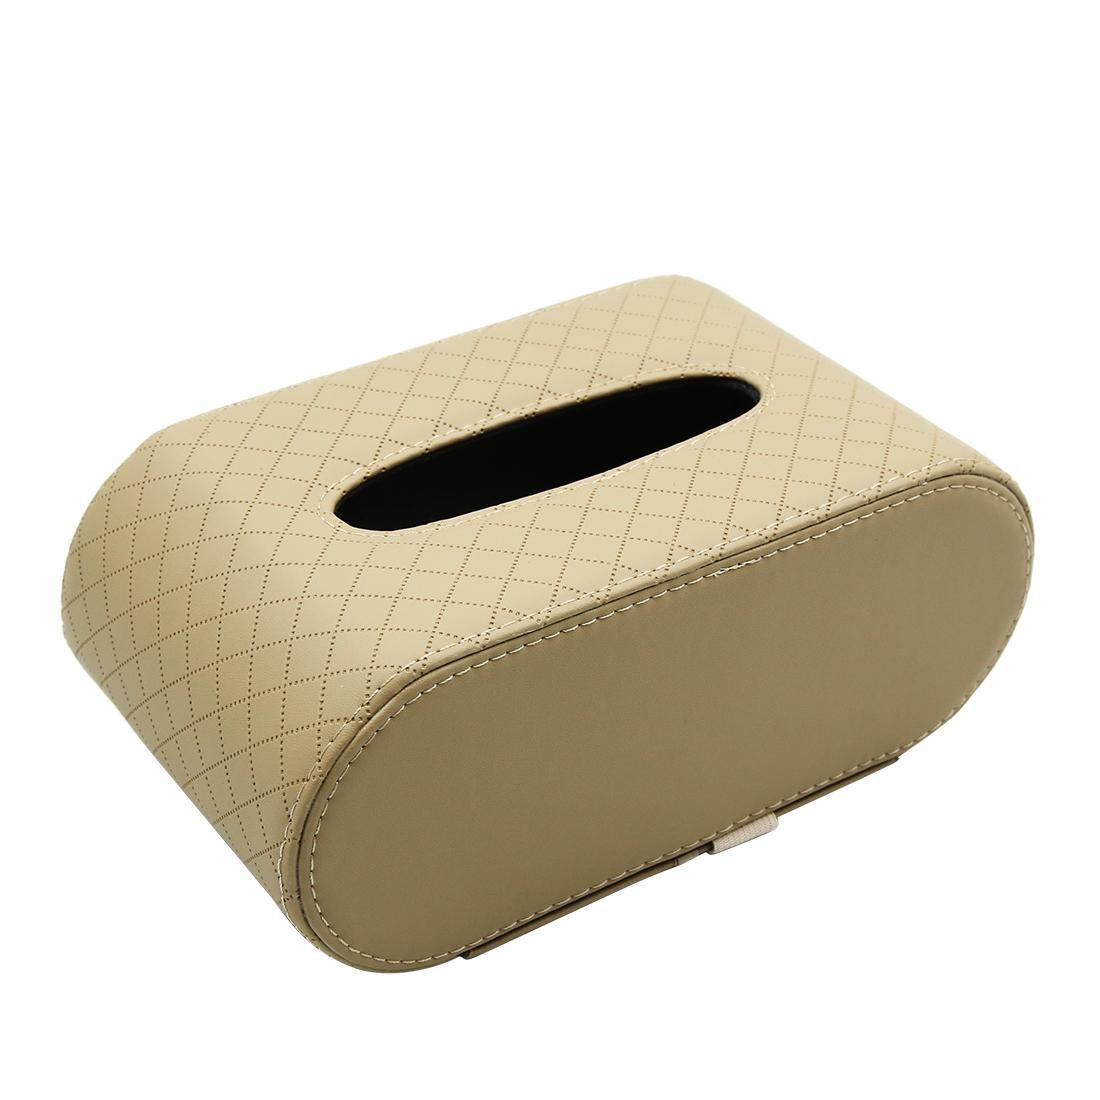 Beige Faux Leather Car Center Console Armrest Tissue Box Paper Napkin Holder